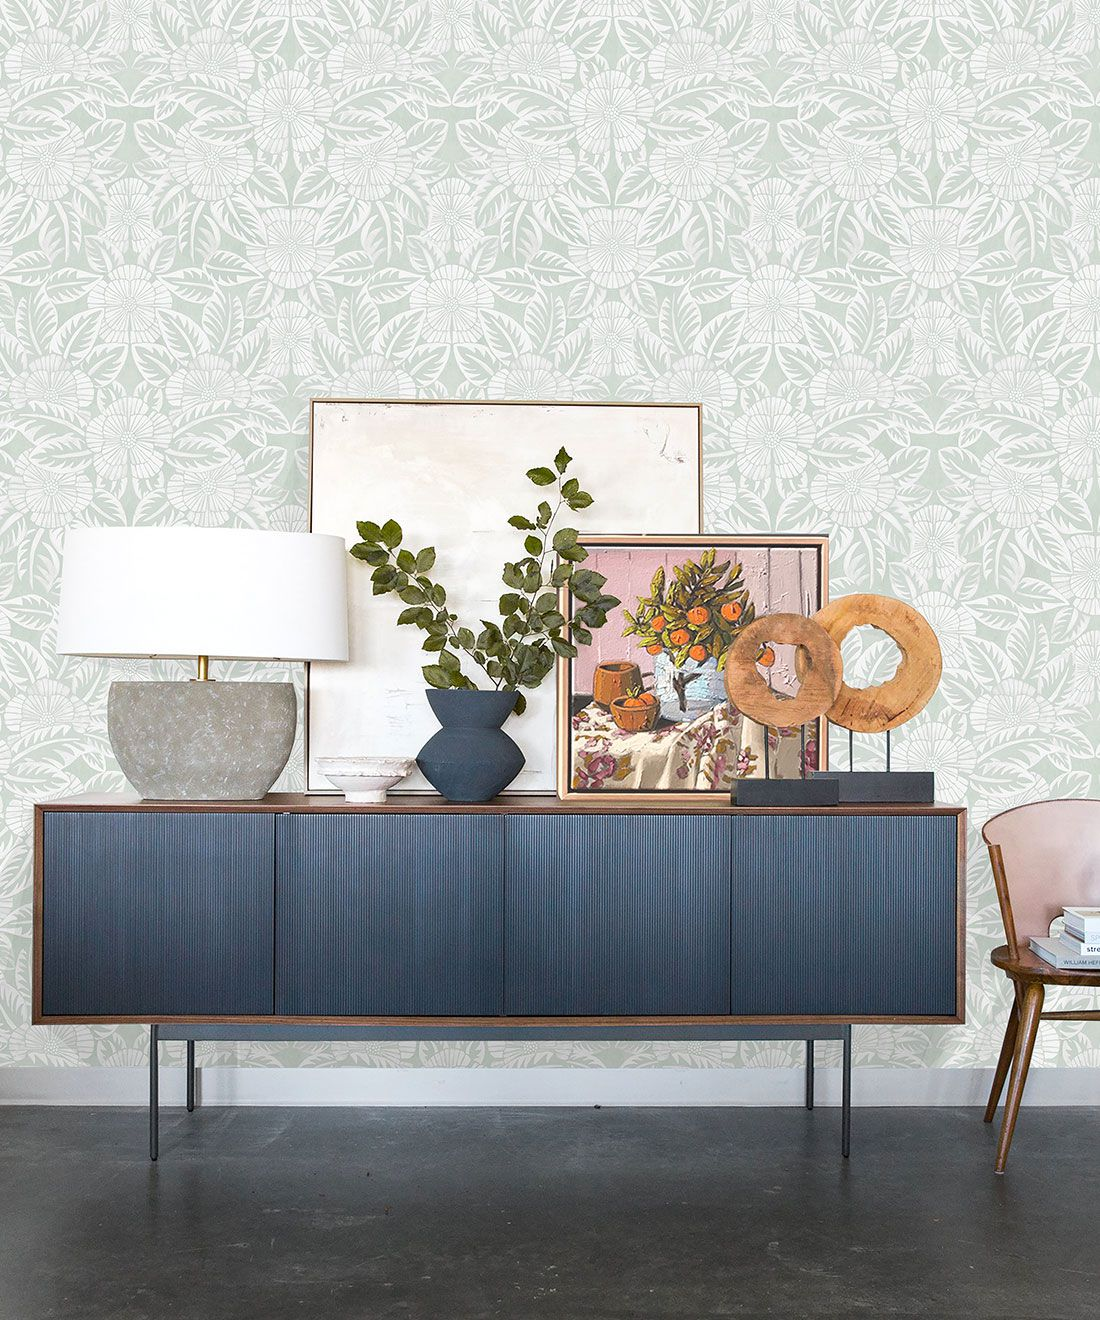 Calcutta Wallpaper • Flower and Leaf Motif Design • Ethnic Wallpaper • Aqua Wallpaper • Insitu